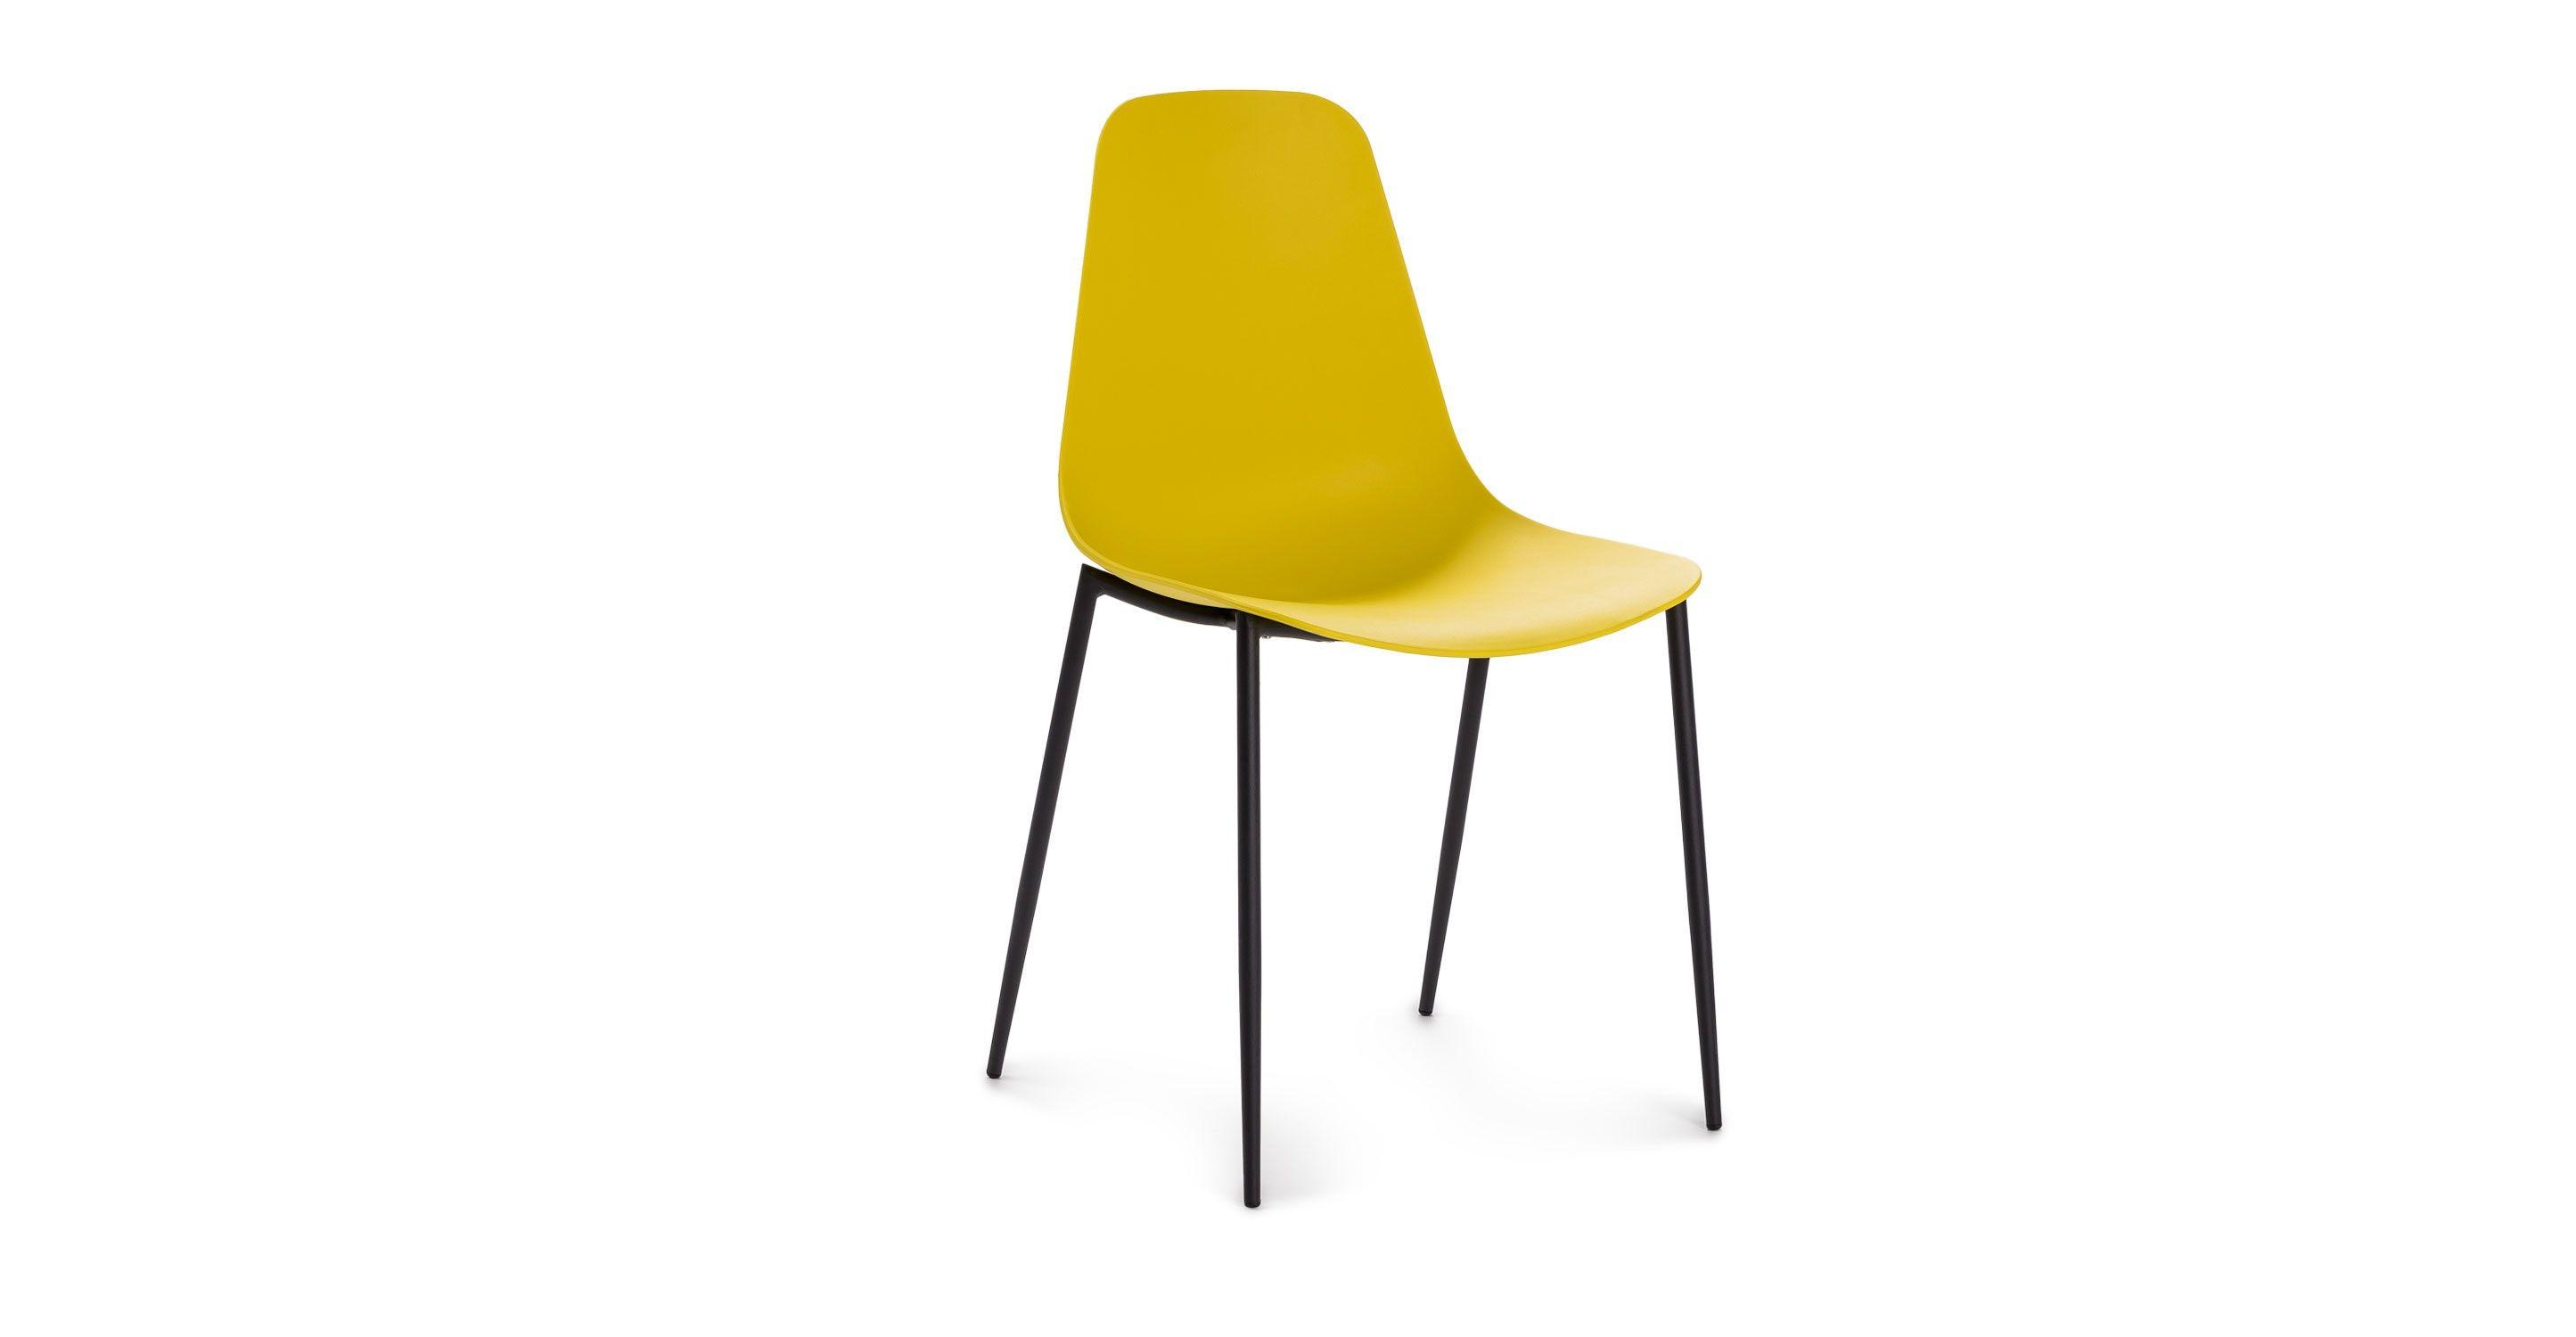 Svelti Daisy Yellow Dining Chair Yellow Dining Chairs Retro